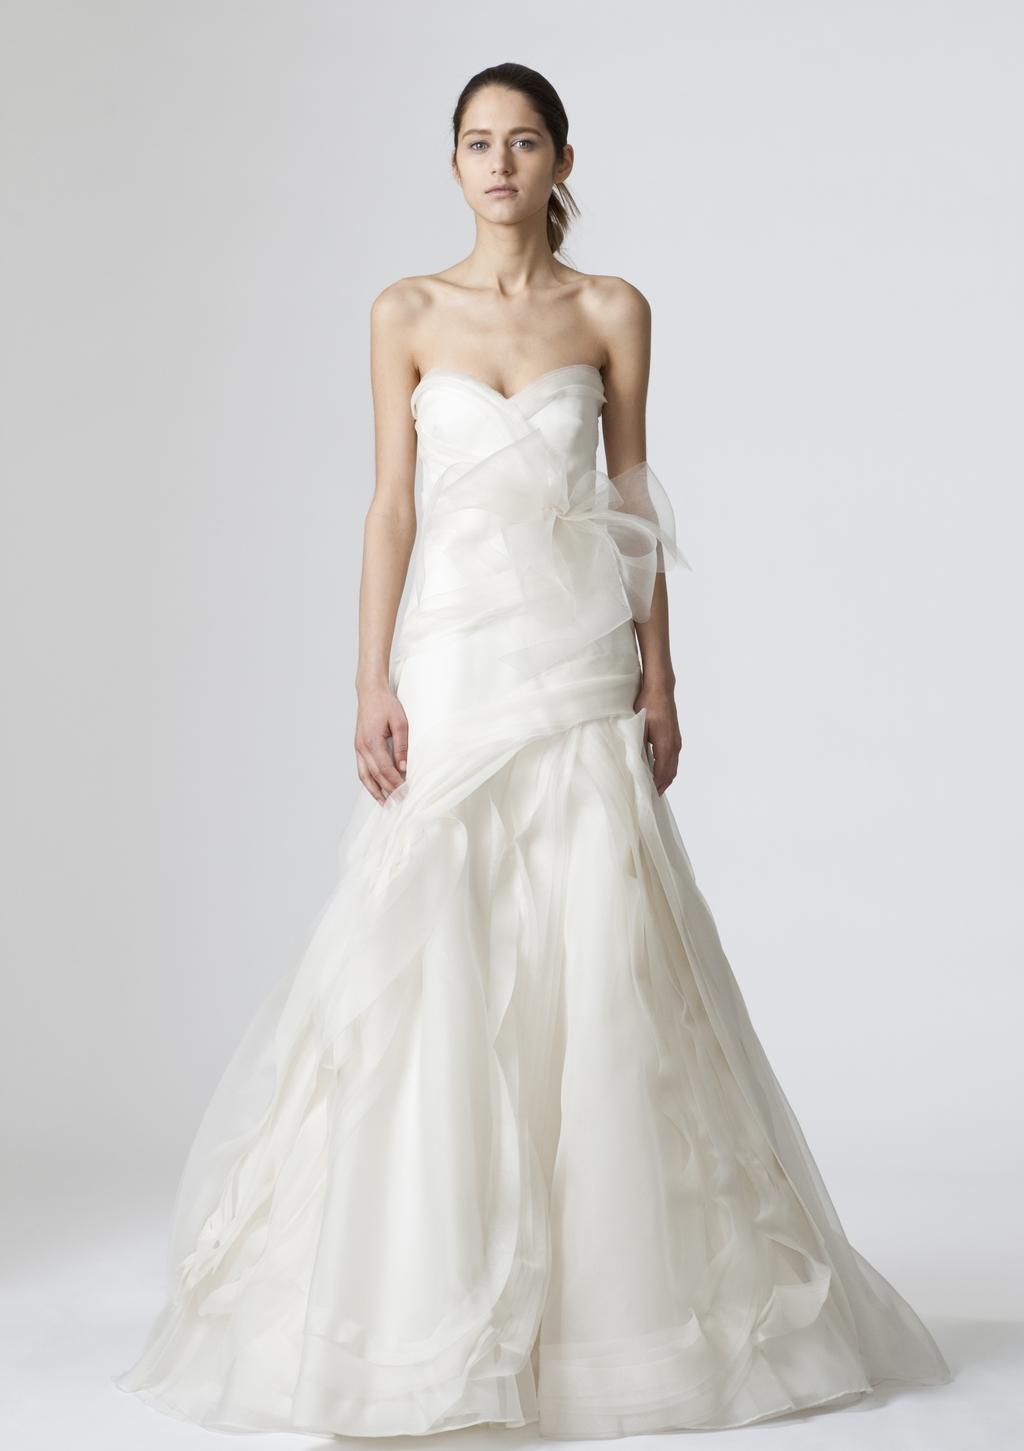 Vera-wang-wedding-dresses-spring-2010-8.full